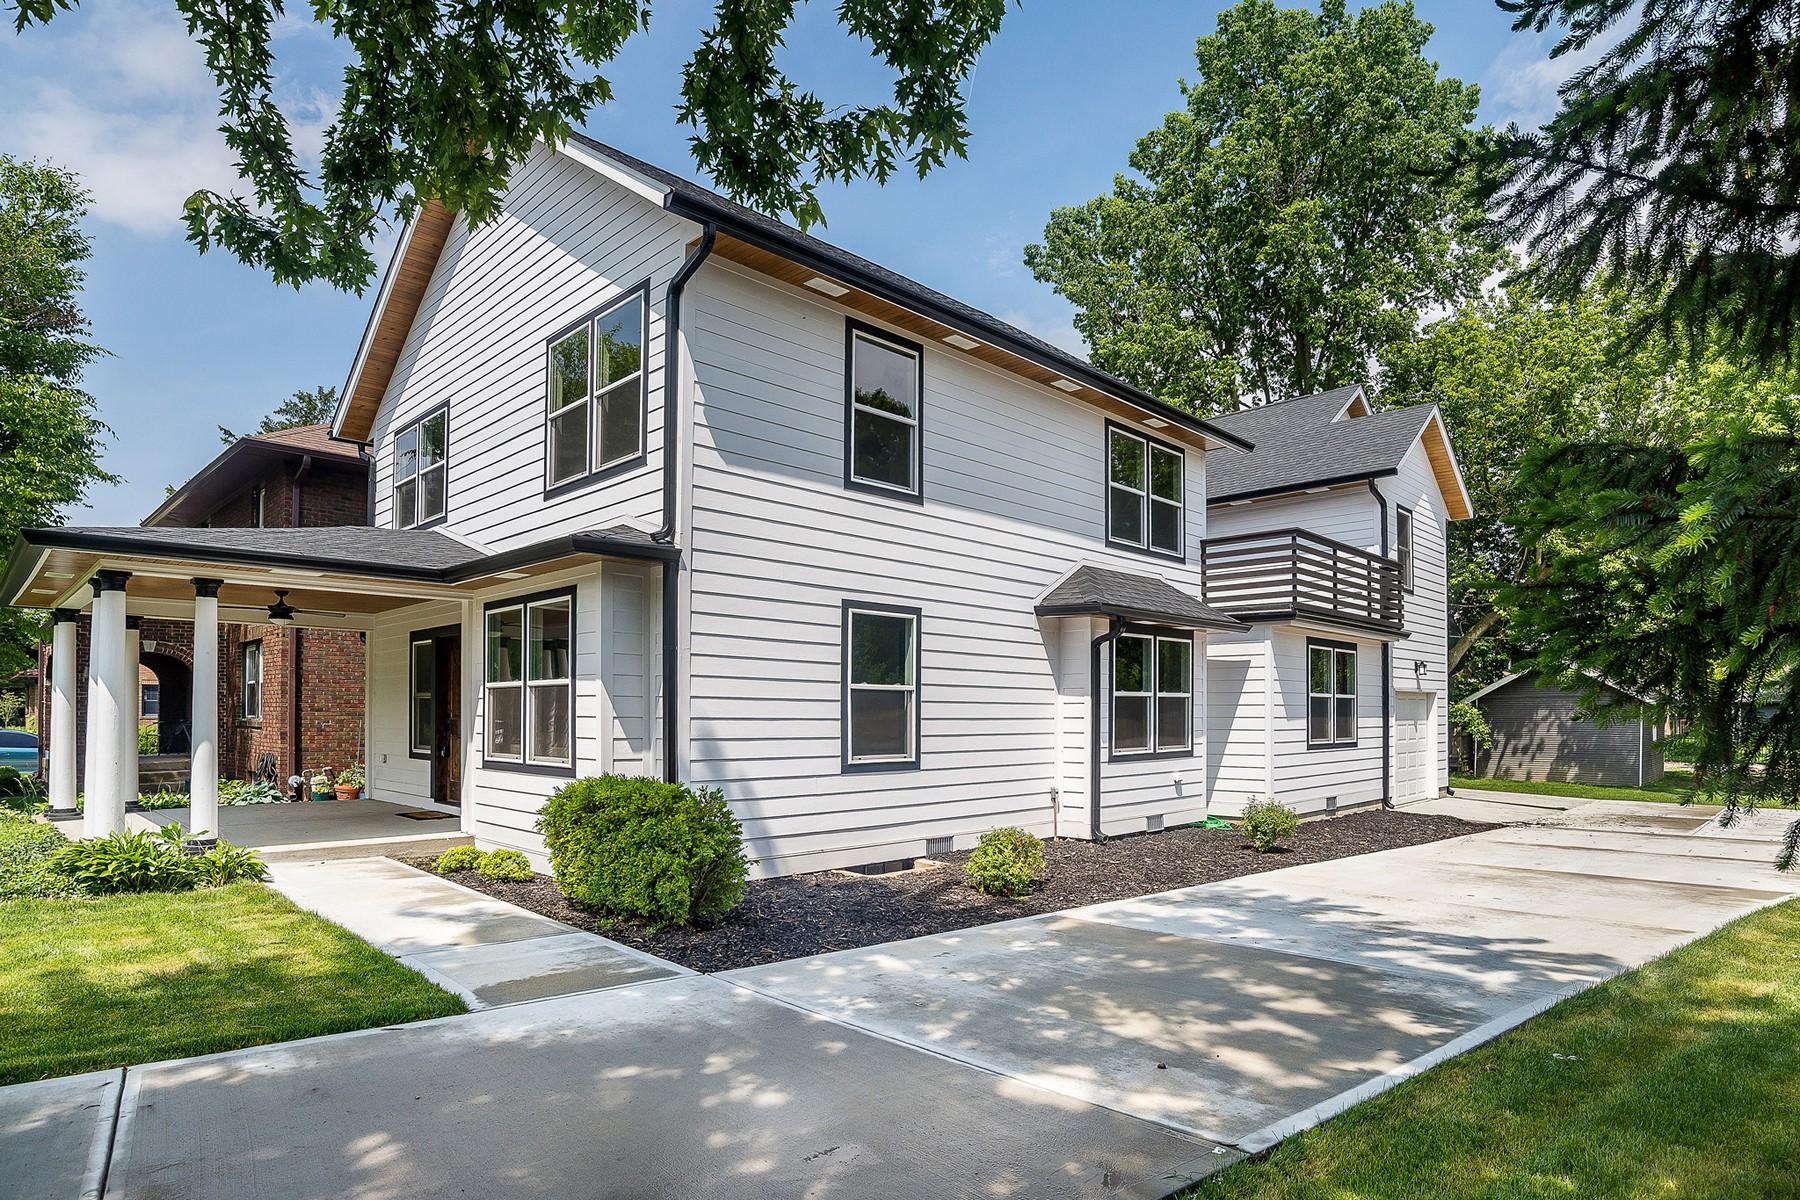 Casa para uma família para Venda às Completely Renovated & Updated! 4927 N. Pennsylvania Street Indianapolis, Indiana, 46205 Estados Unidos